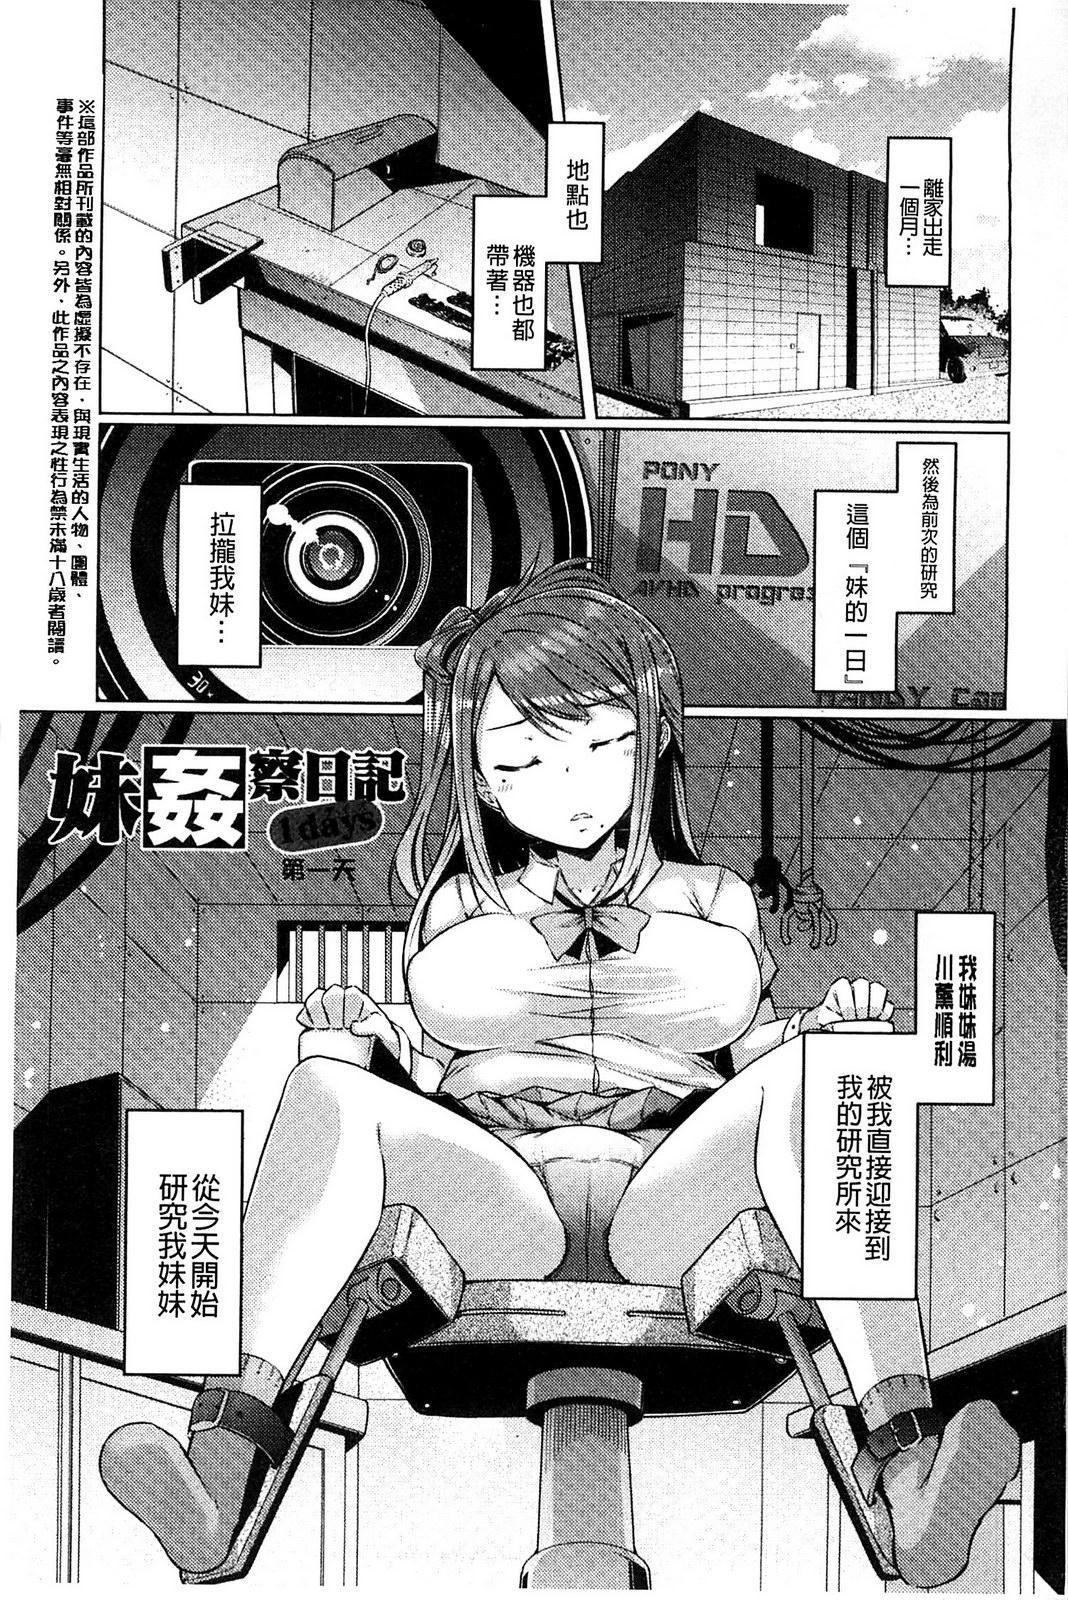 Imouto Kansatsu Nikki - The Record of Sex with My Sister 5